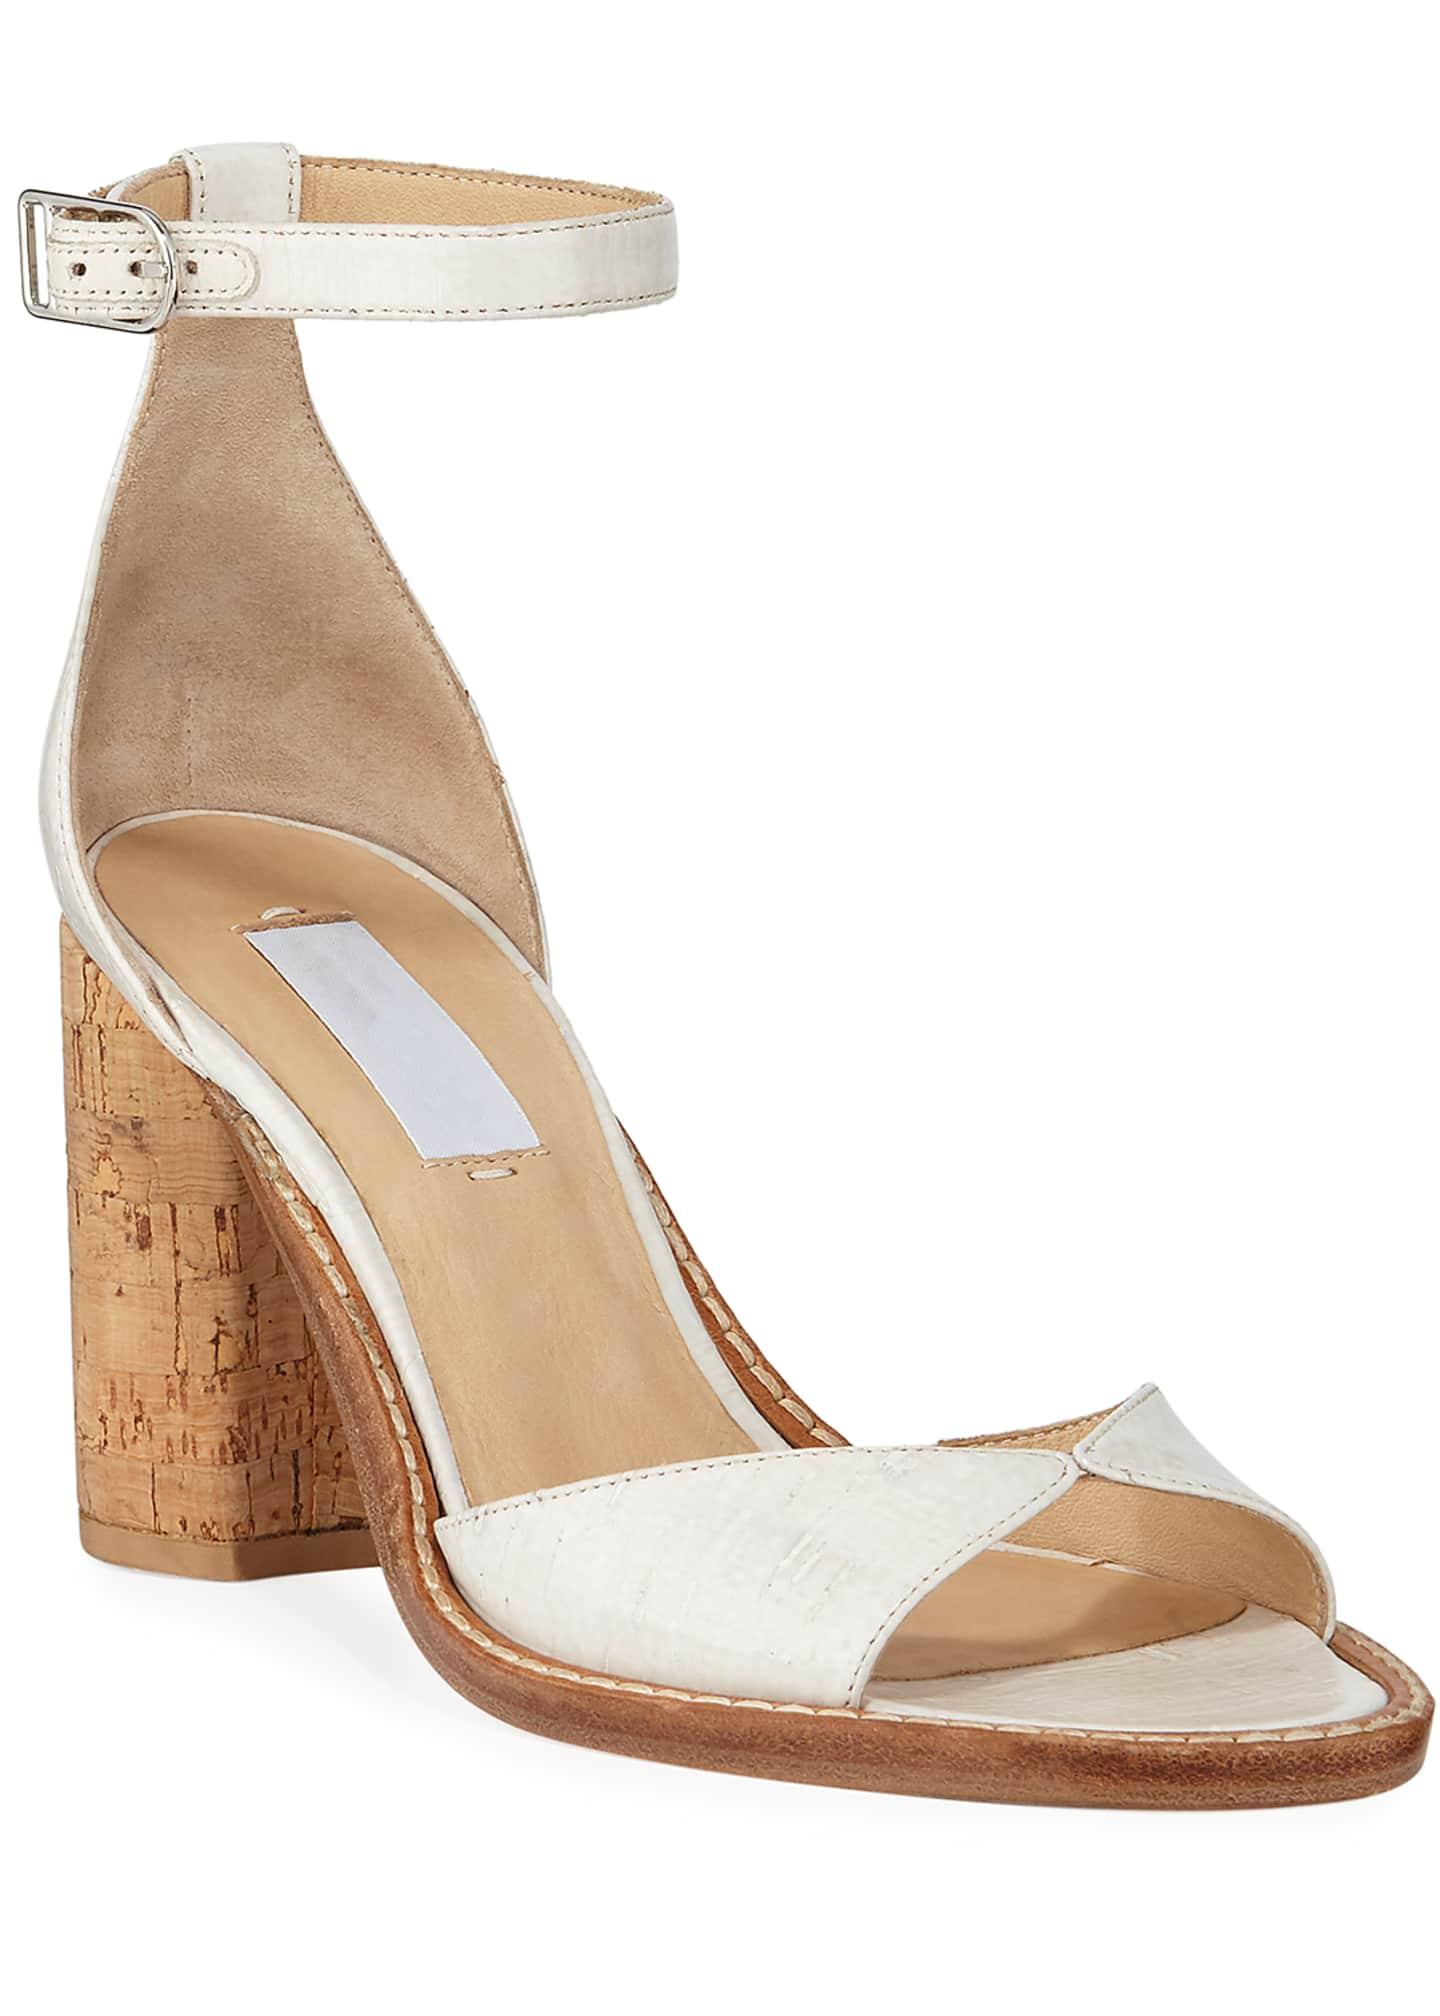 Gabriela Hearst Adi Leather Ankle Sandals